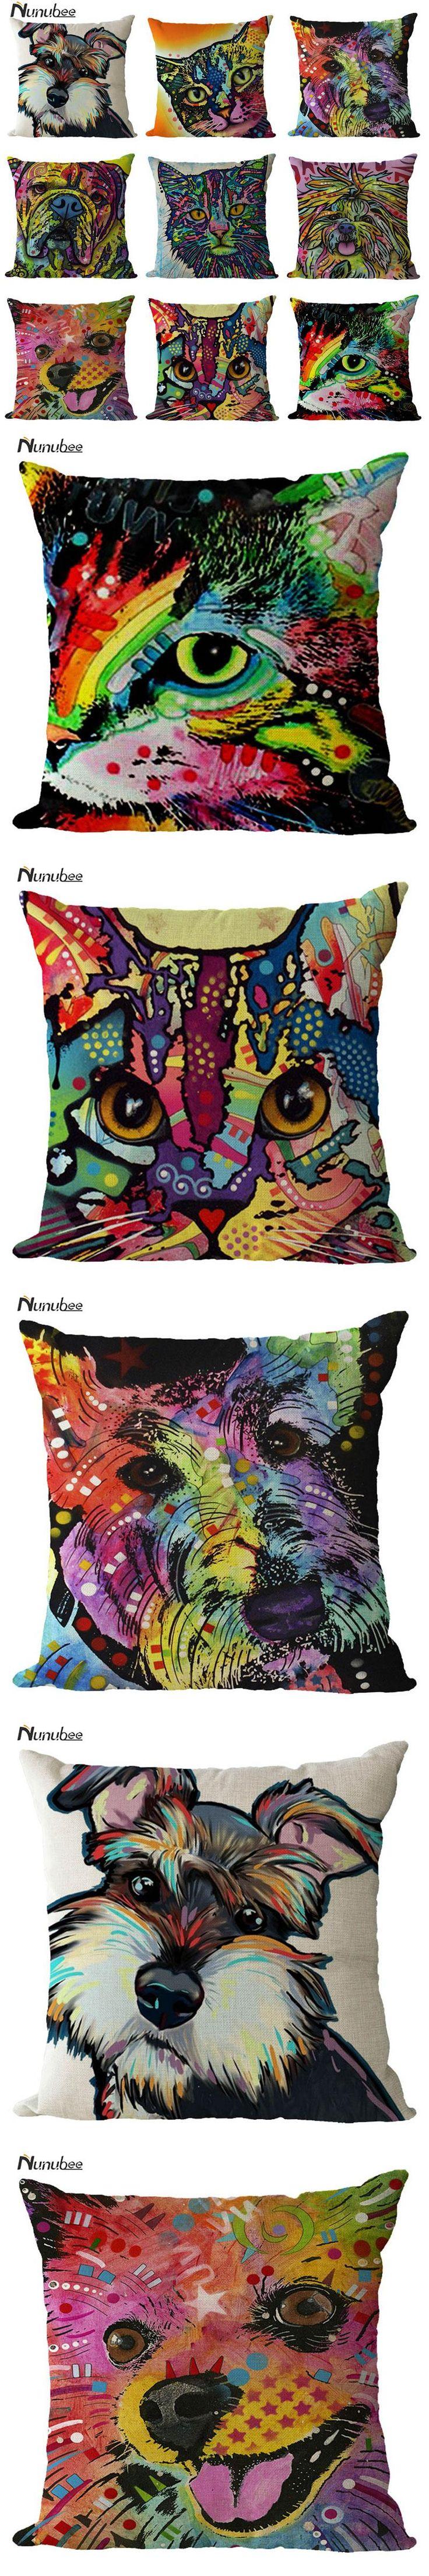 CushionCover Funny Pig Dog Cat Color Painting CushionLinen Throw Pillows Car Sofa Cushion Decorative Pillowcase decorativos